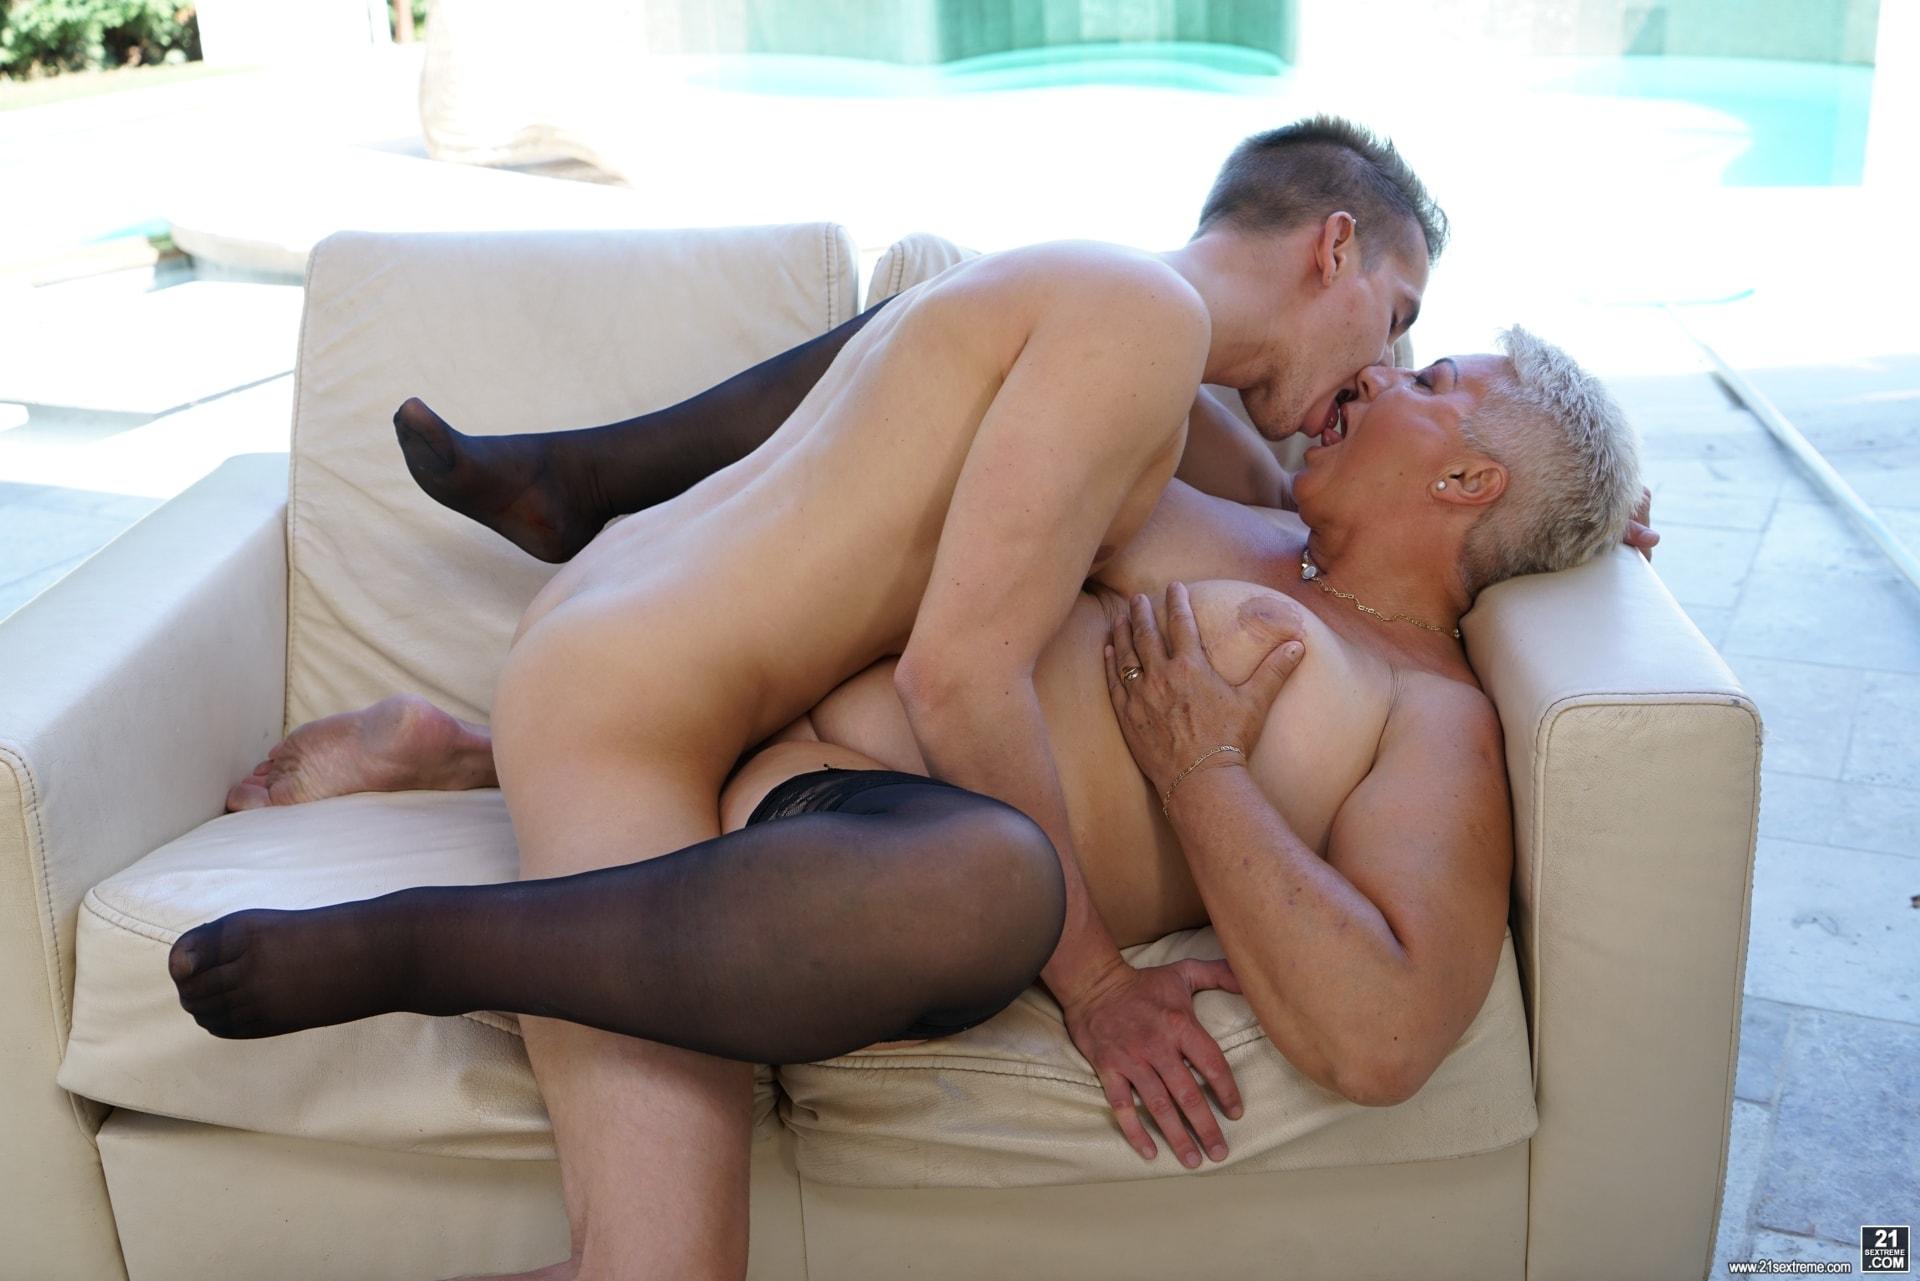 21Sextury 'Lusty Granny's Poolside Fuck' starring Astrid (Photo 234)